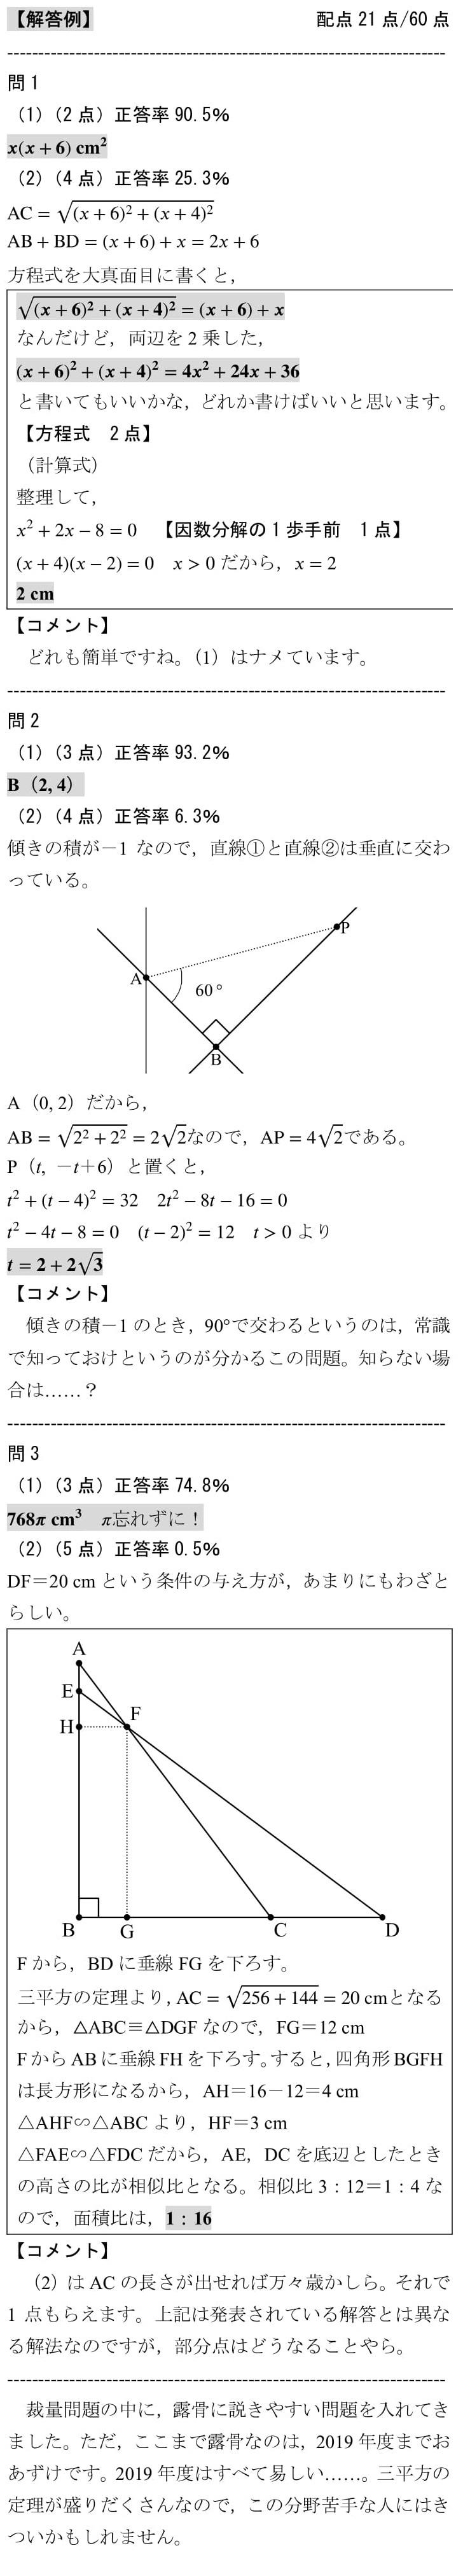 Sairyo_math_2013-2.jpg